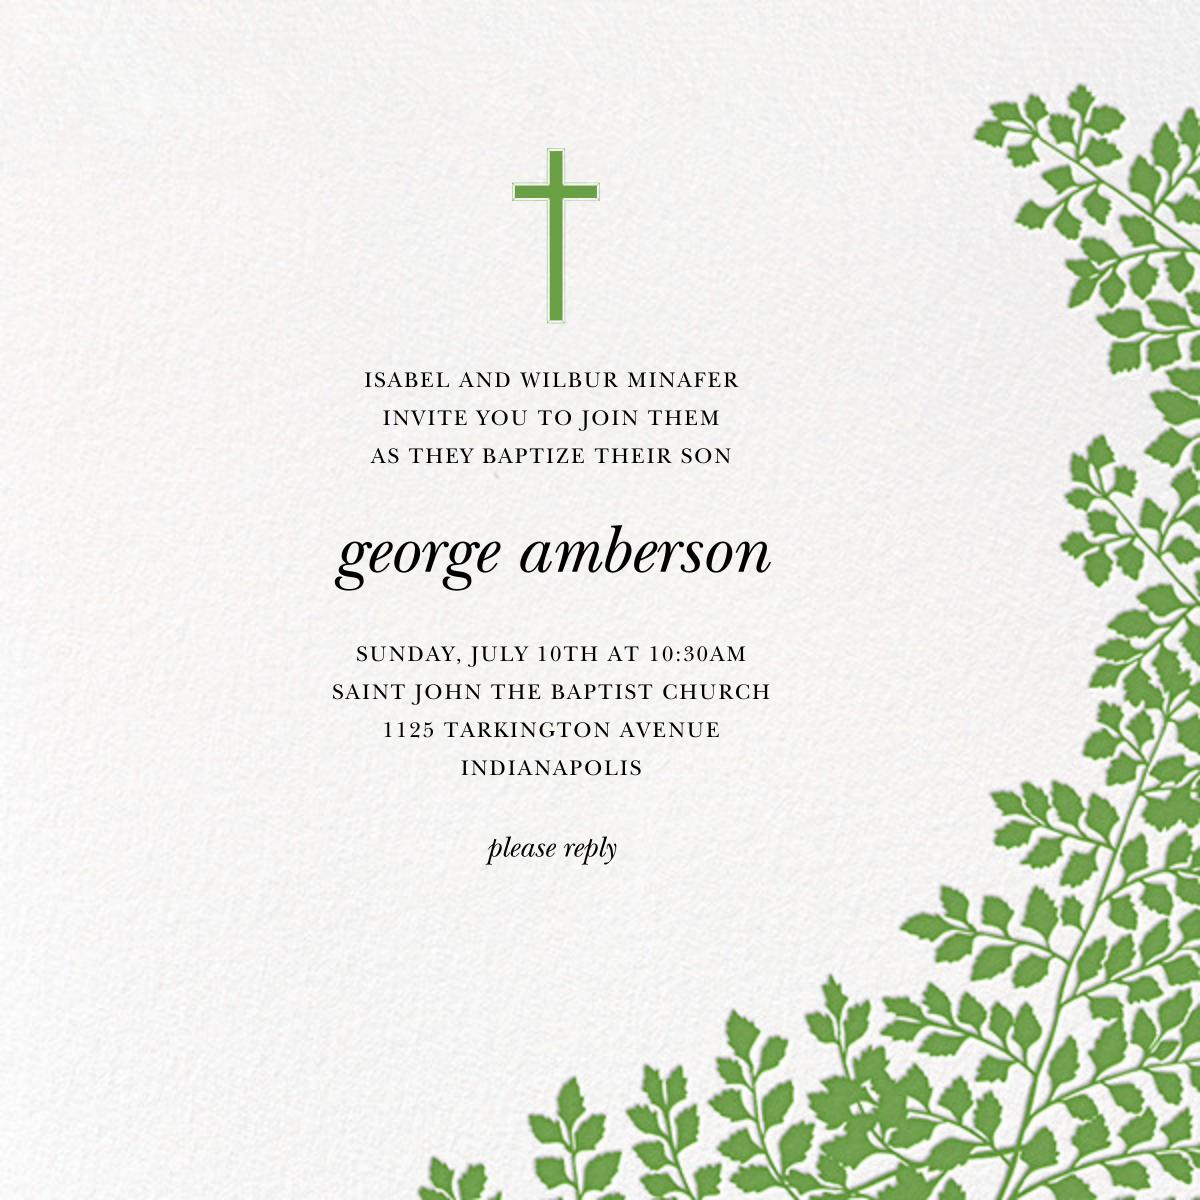 Fern II - Green - Paperless Post - Baptism